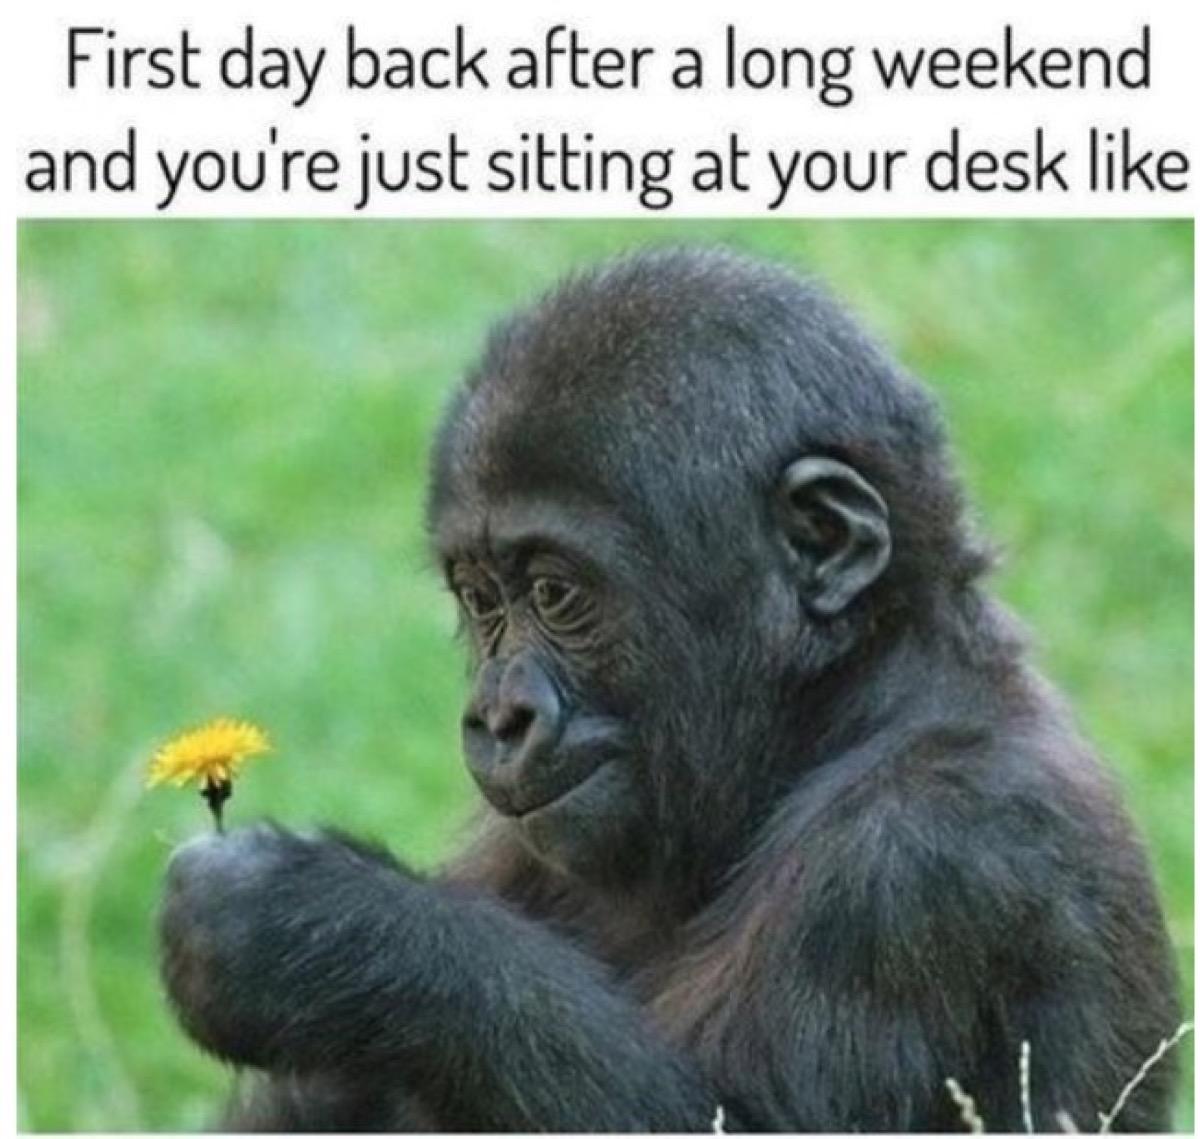 Baby gorilla holding a dandelion meme